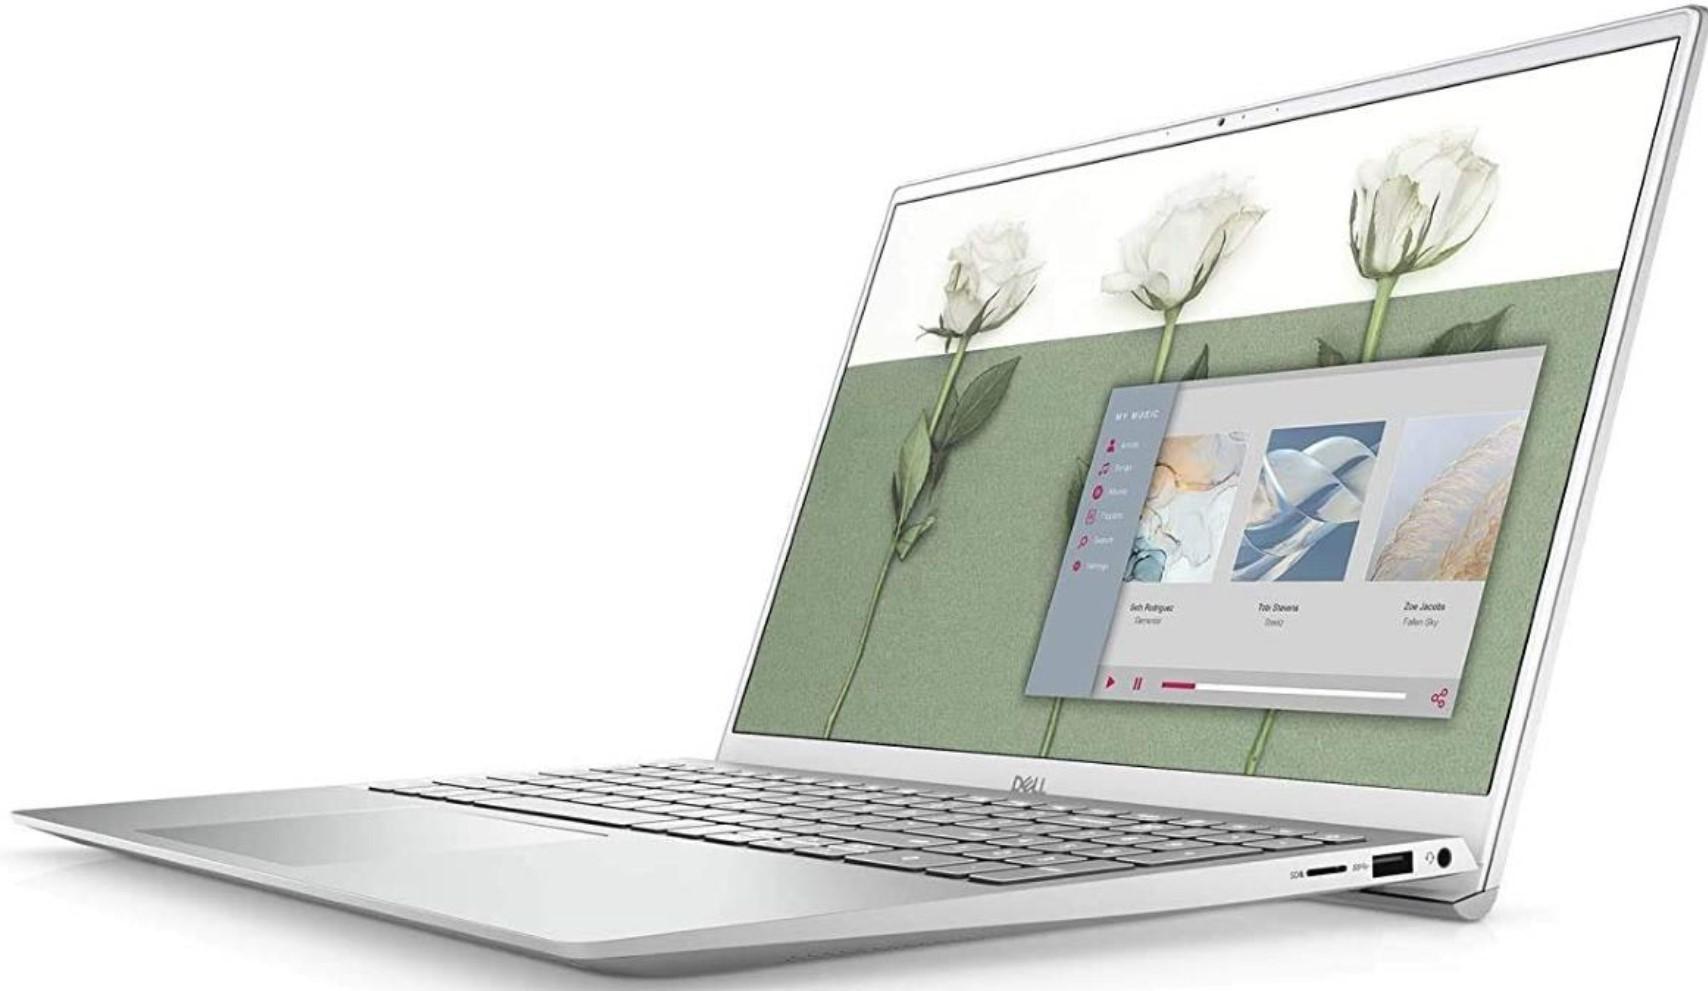 "Dell Inspiron 15.6"" FHD WVA Ryzen™ 7 4700U 8GB RAM 256GB SSD Silver Laptop £597.52 at Dell (with code)"